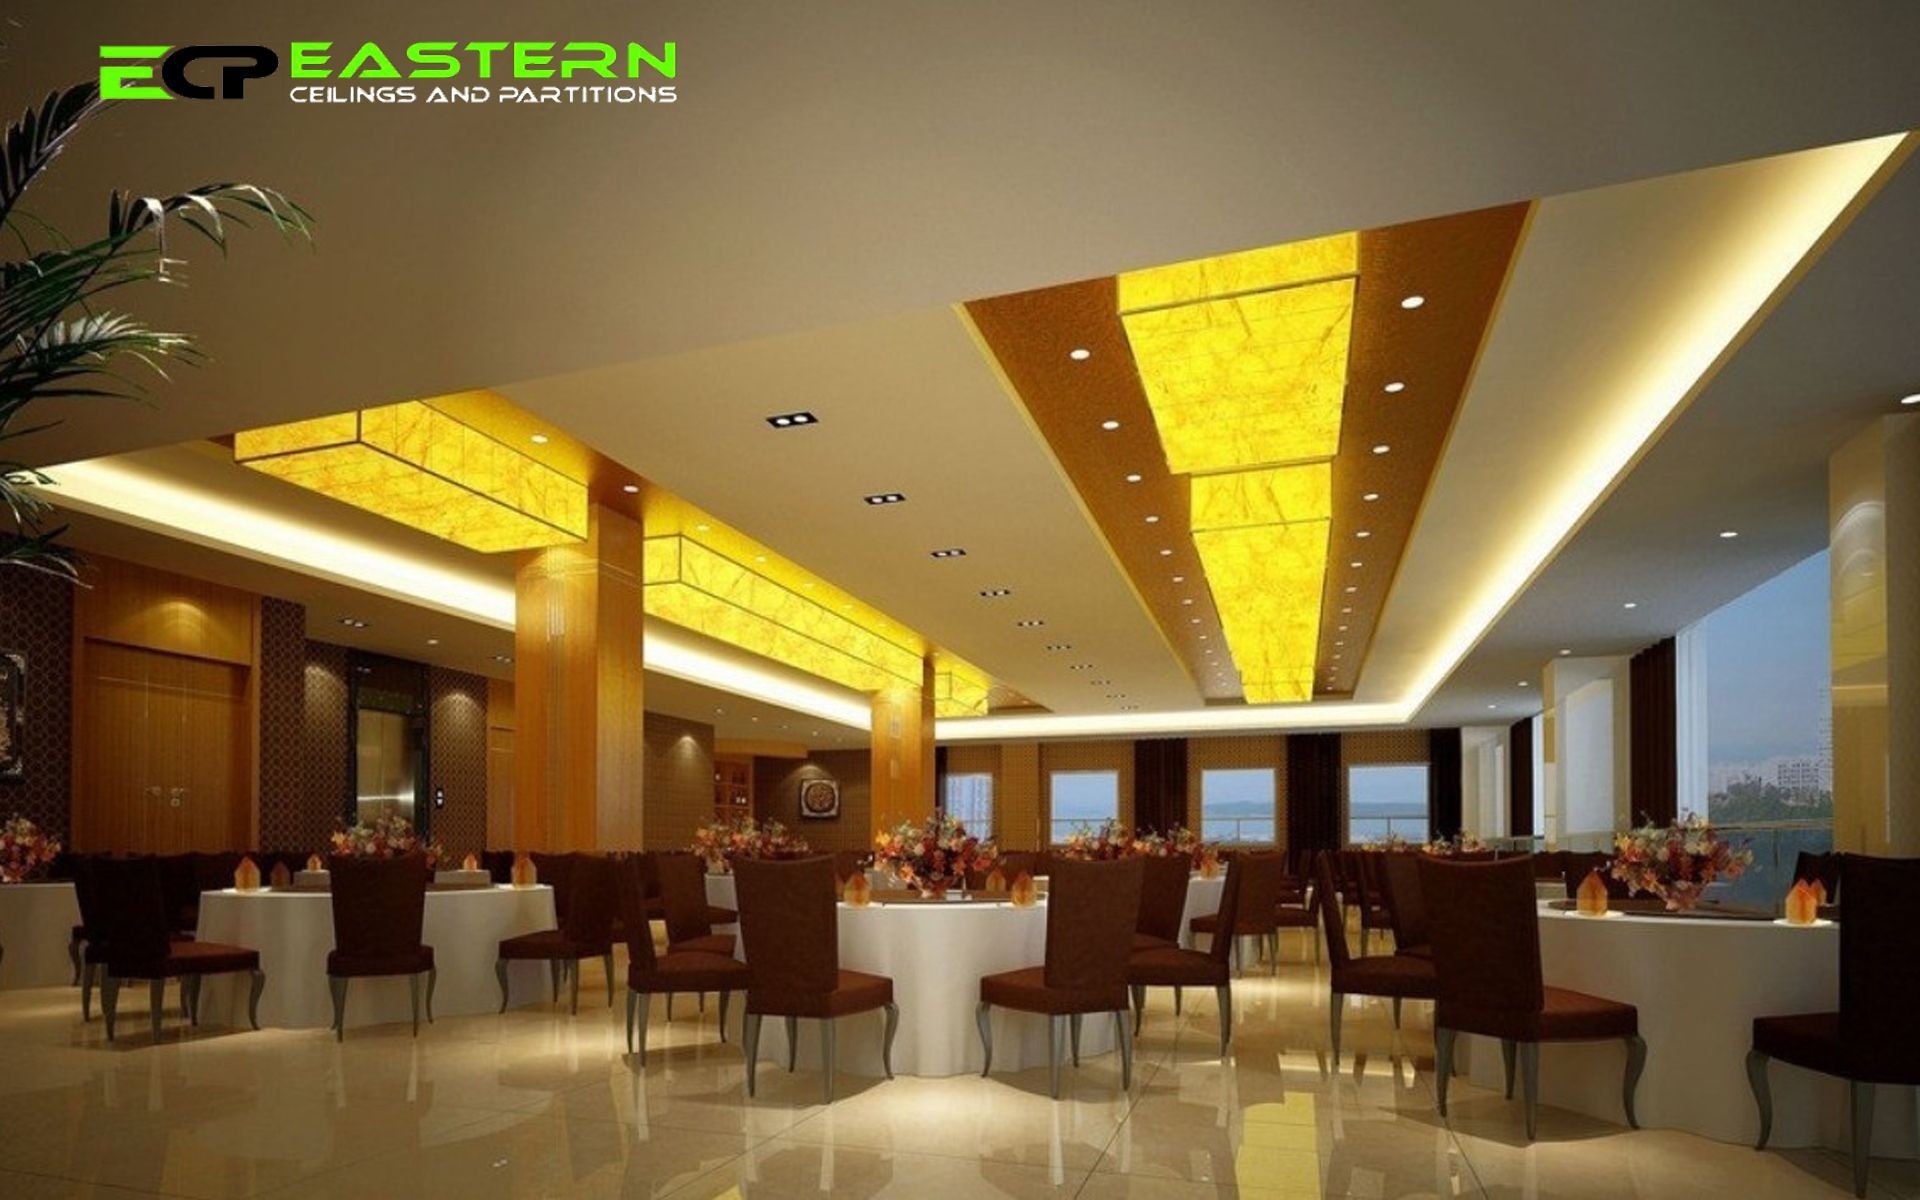 Banquet hall ceiling design. #banquethall #ceilingdesign ...